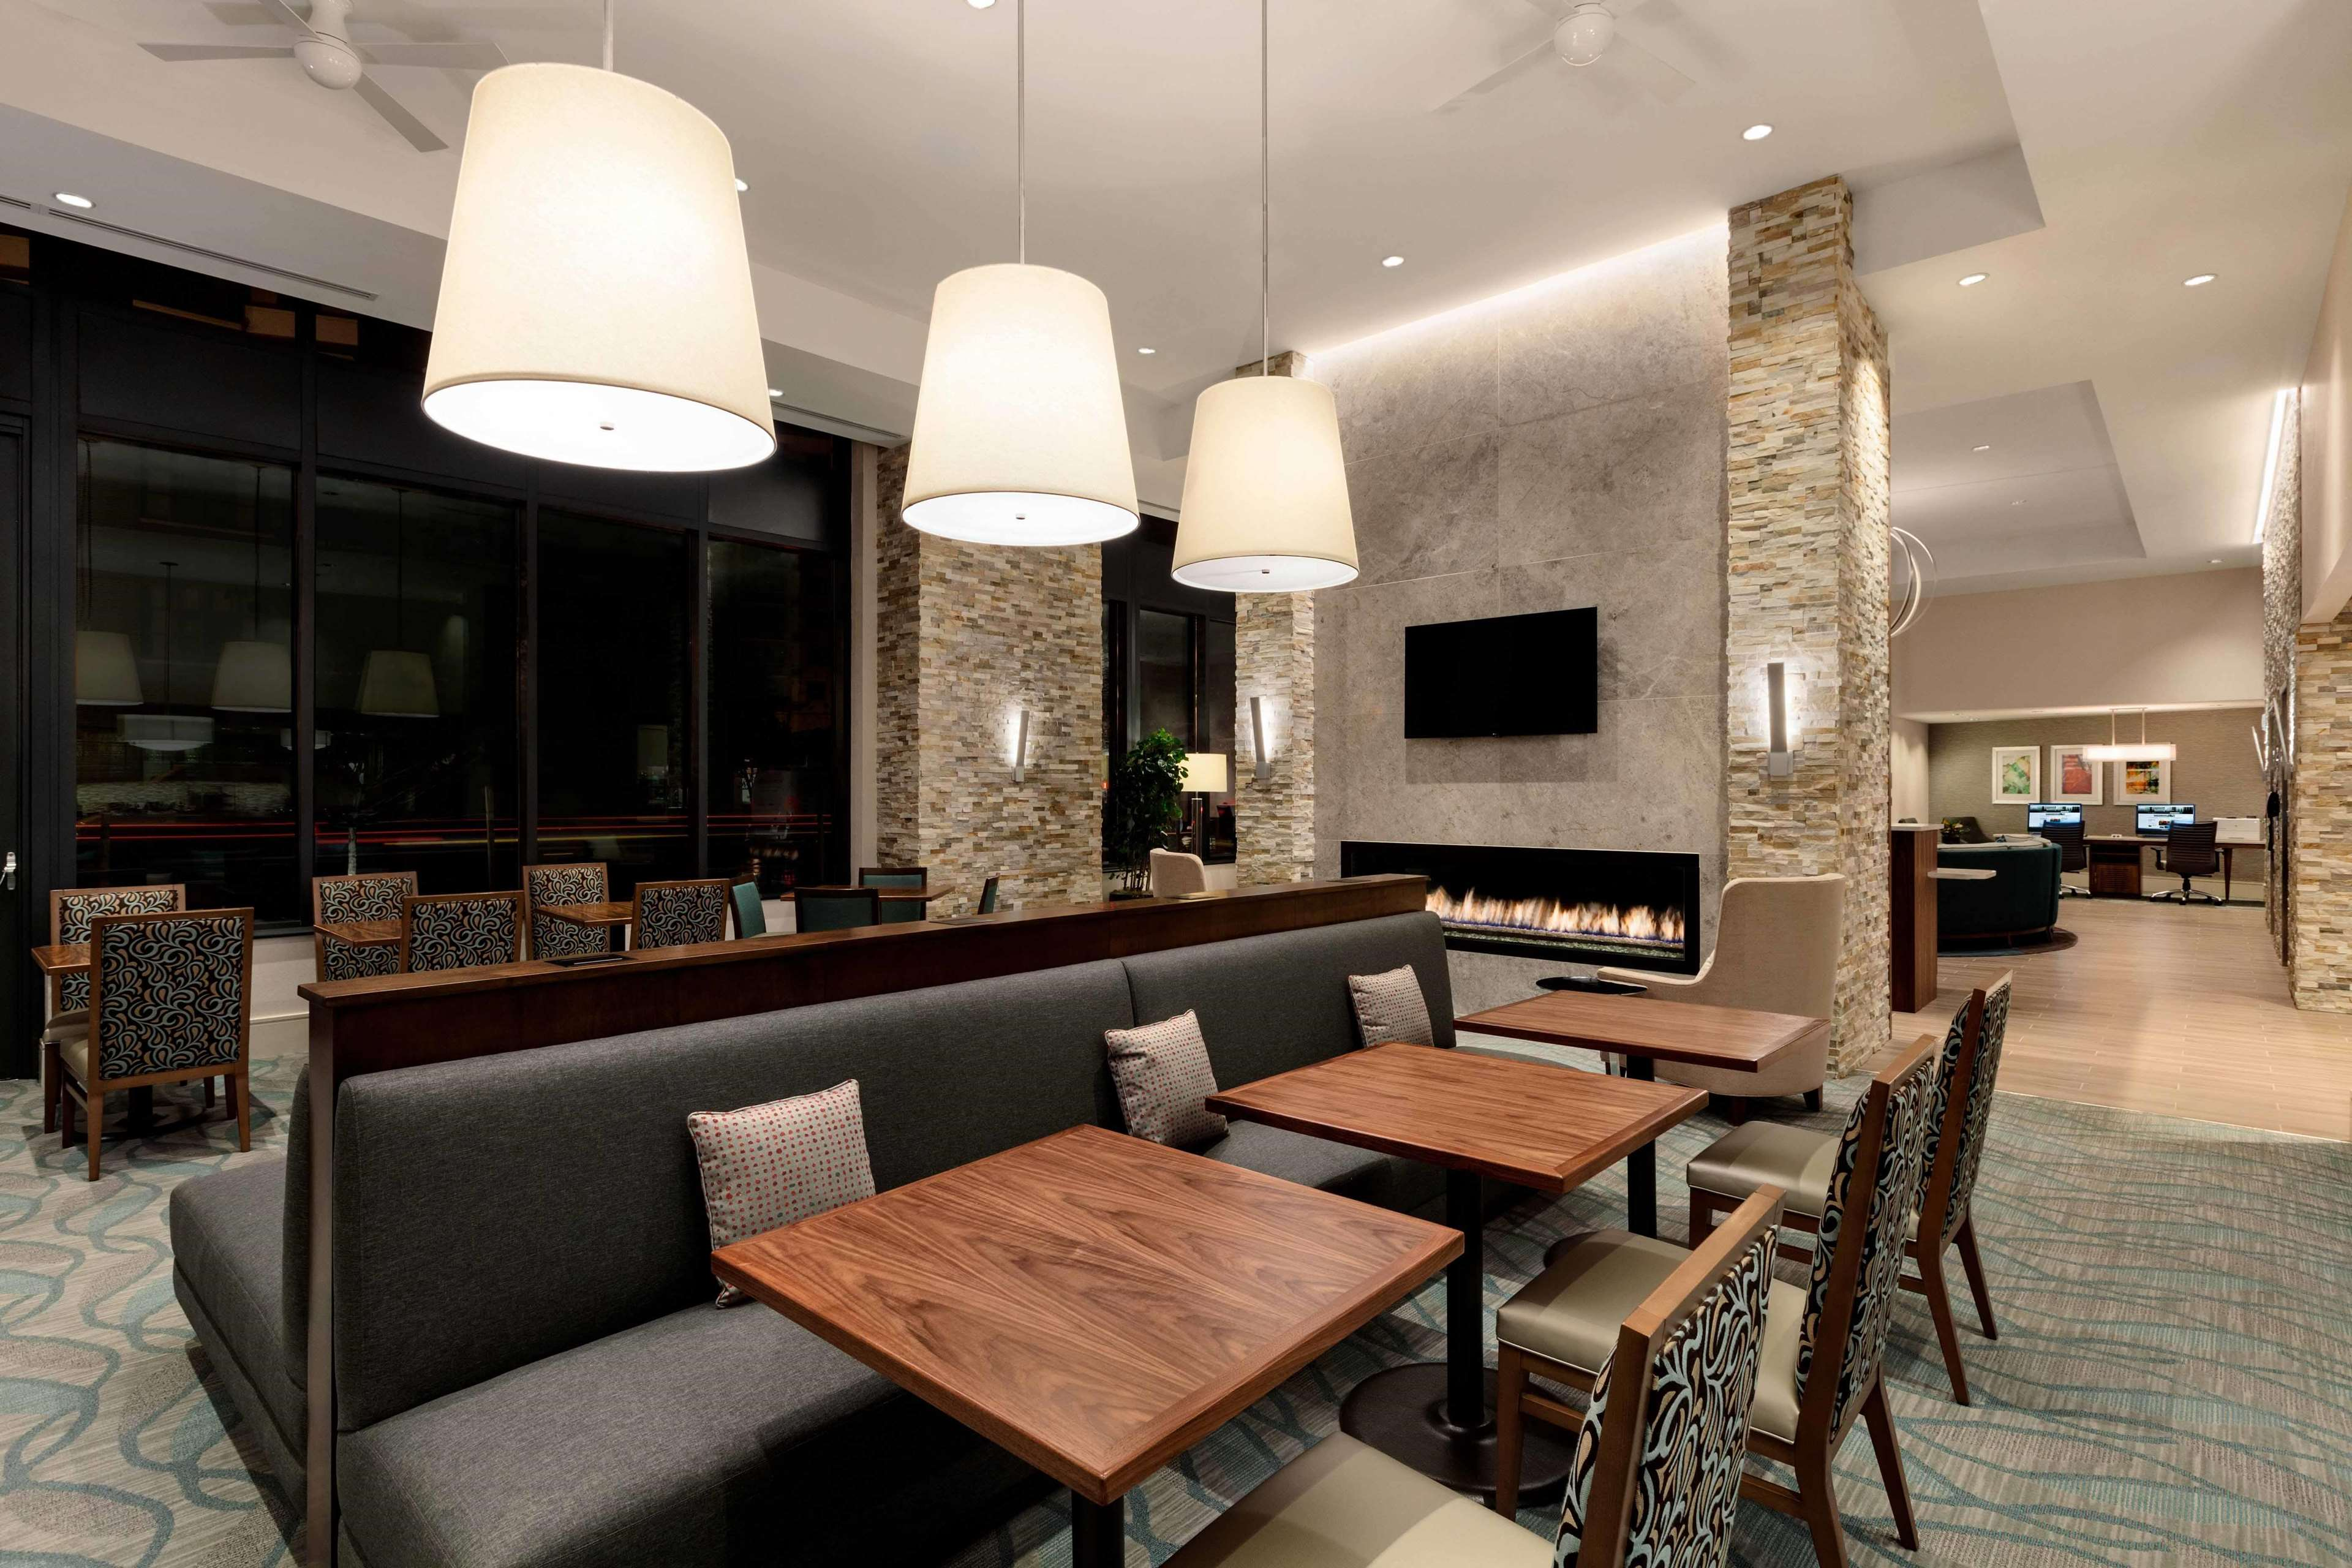 Homewood Suites by Hilton Washington DC Convention Center image 8